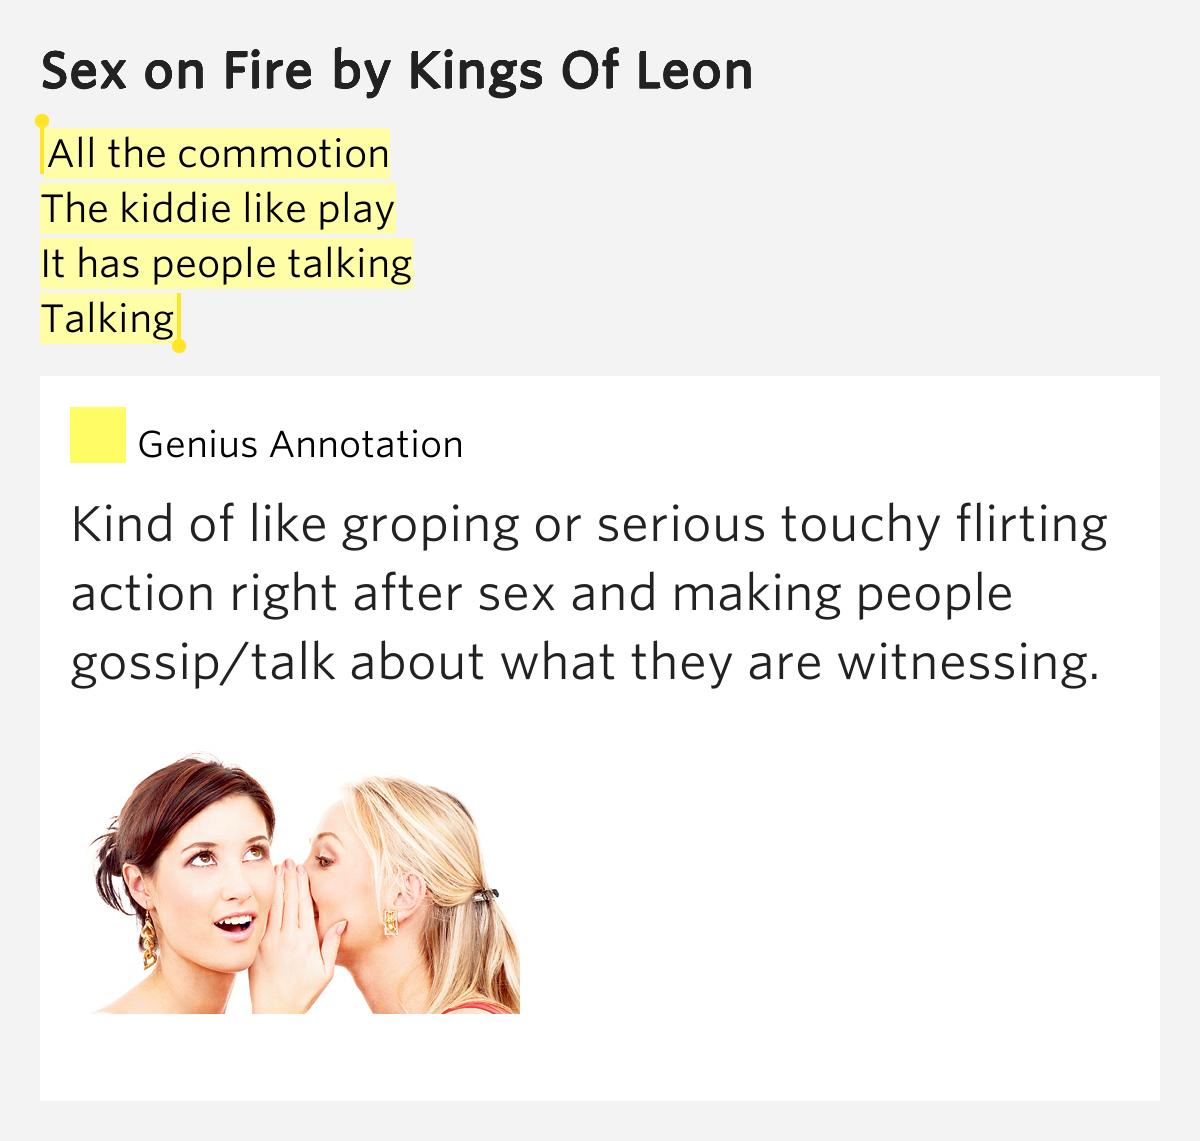 Kings of lion секс в огне перевод текста